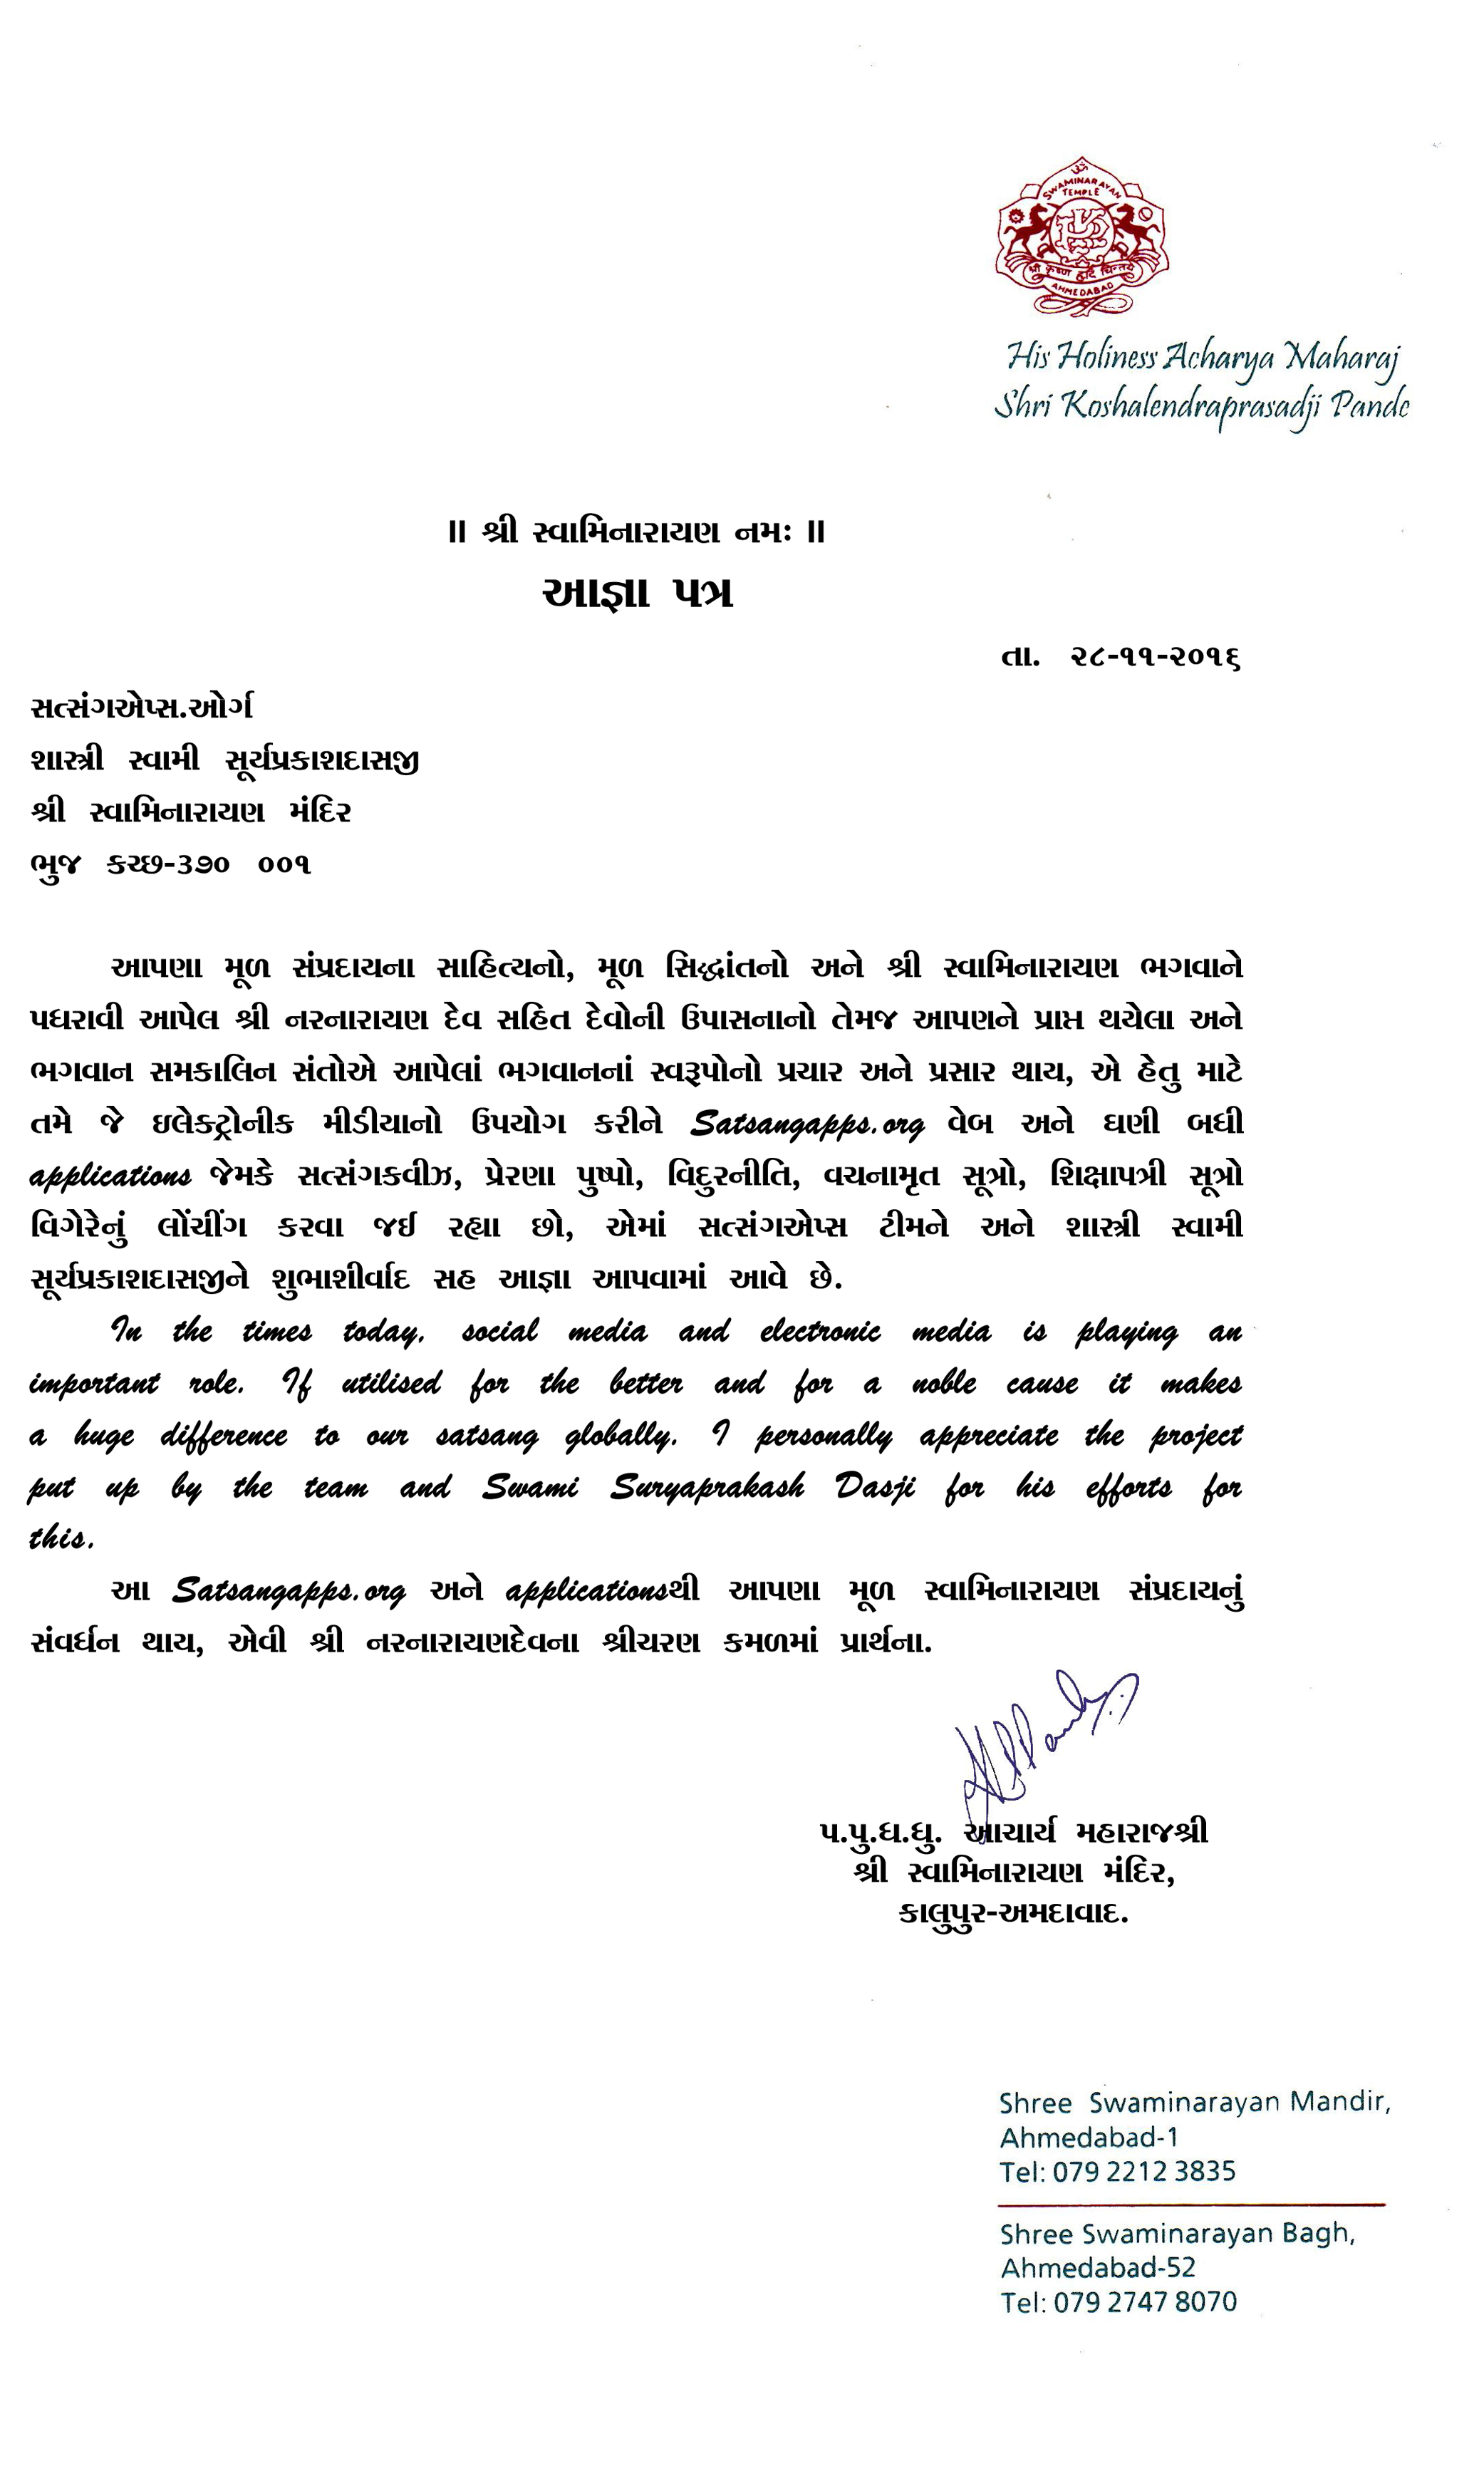 Kaushlendra Prasad Arshi Vachan